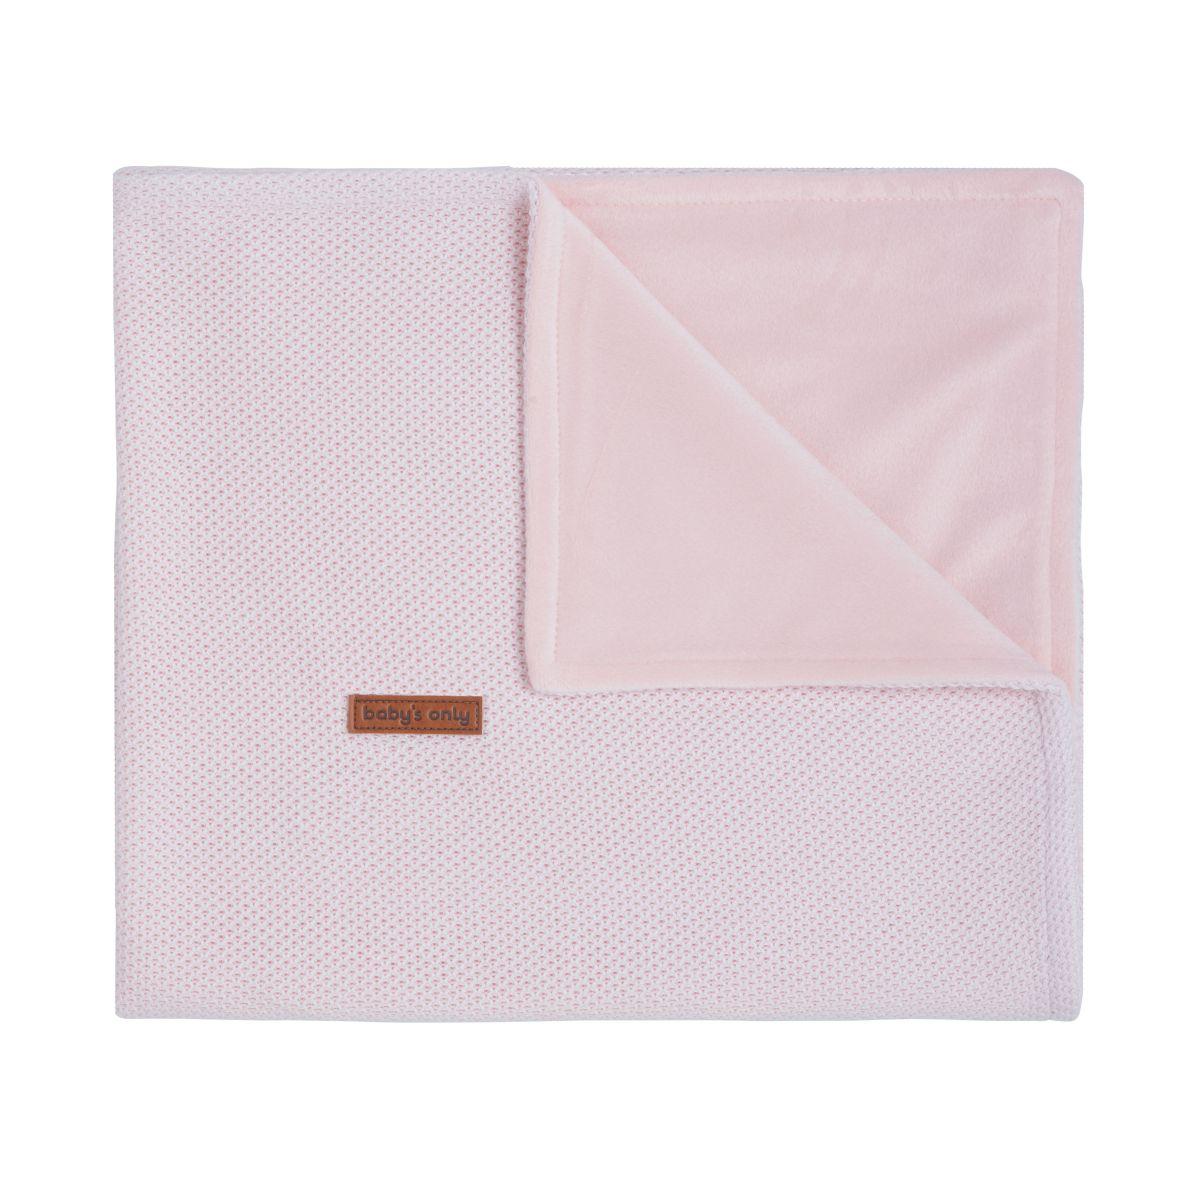 babys only 0201101 ledikantdeken soft classic roze